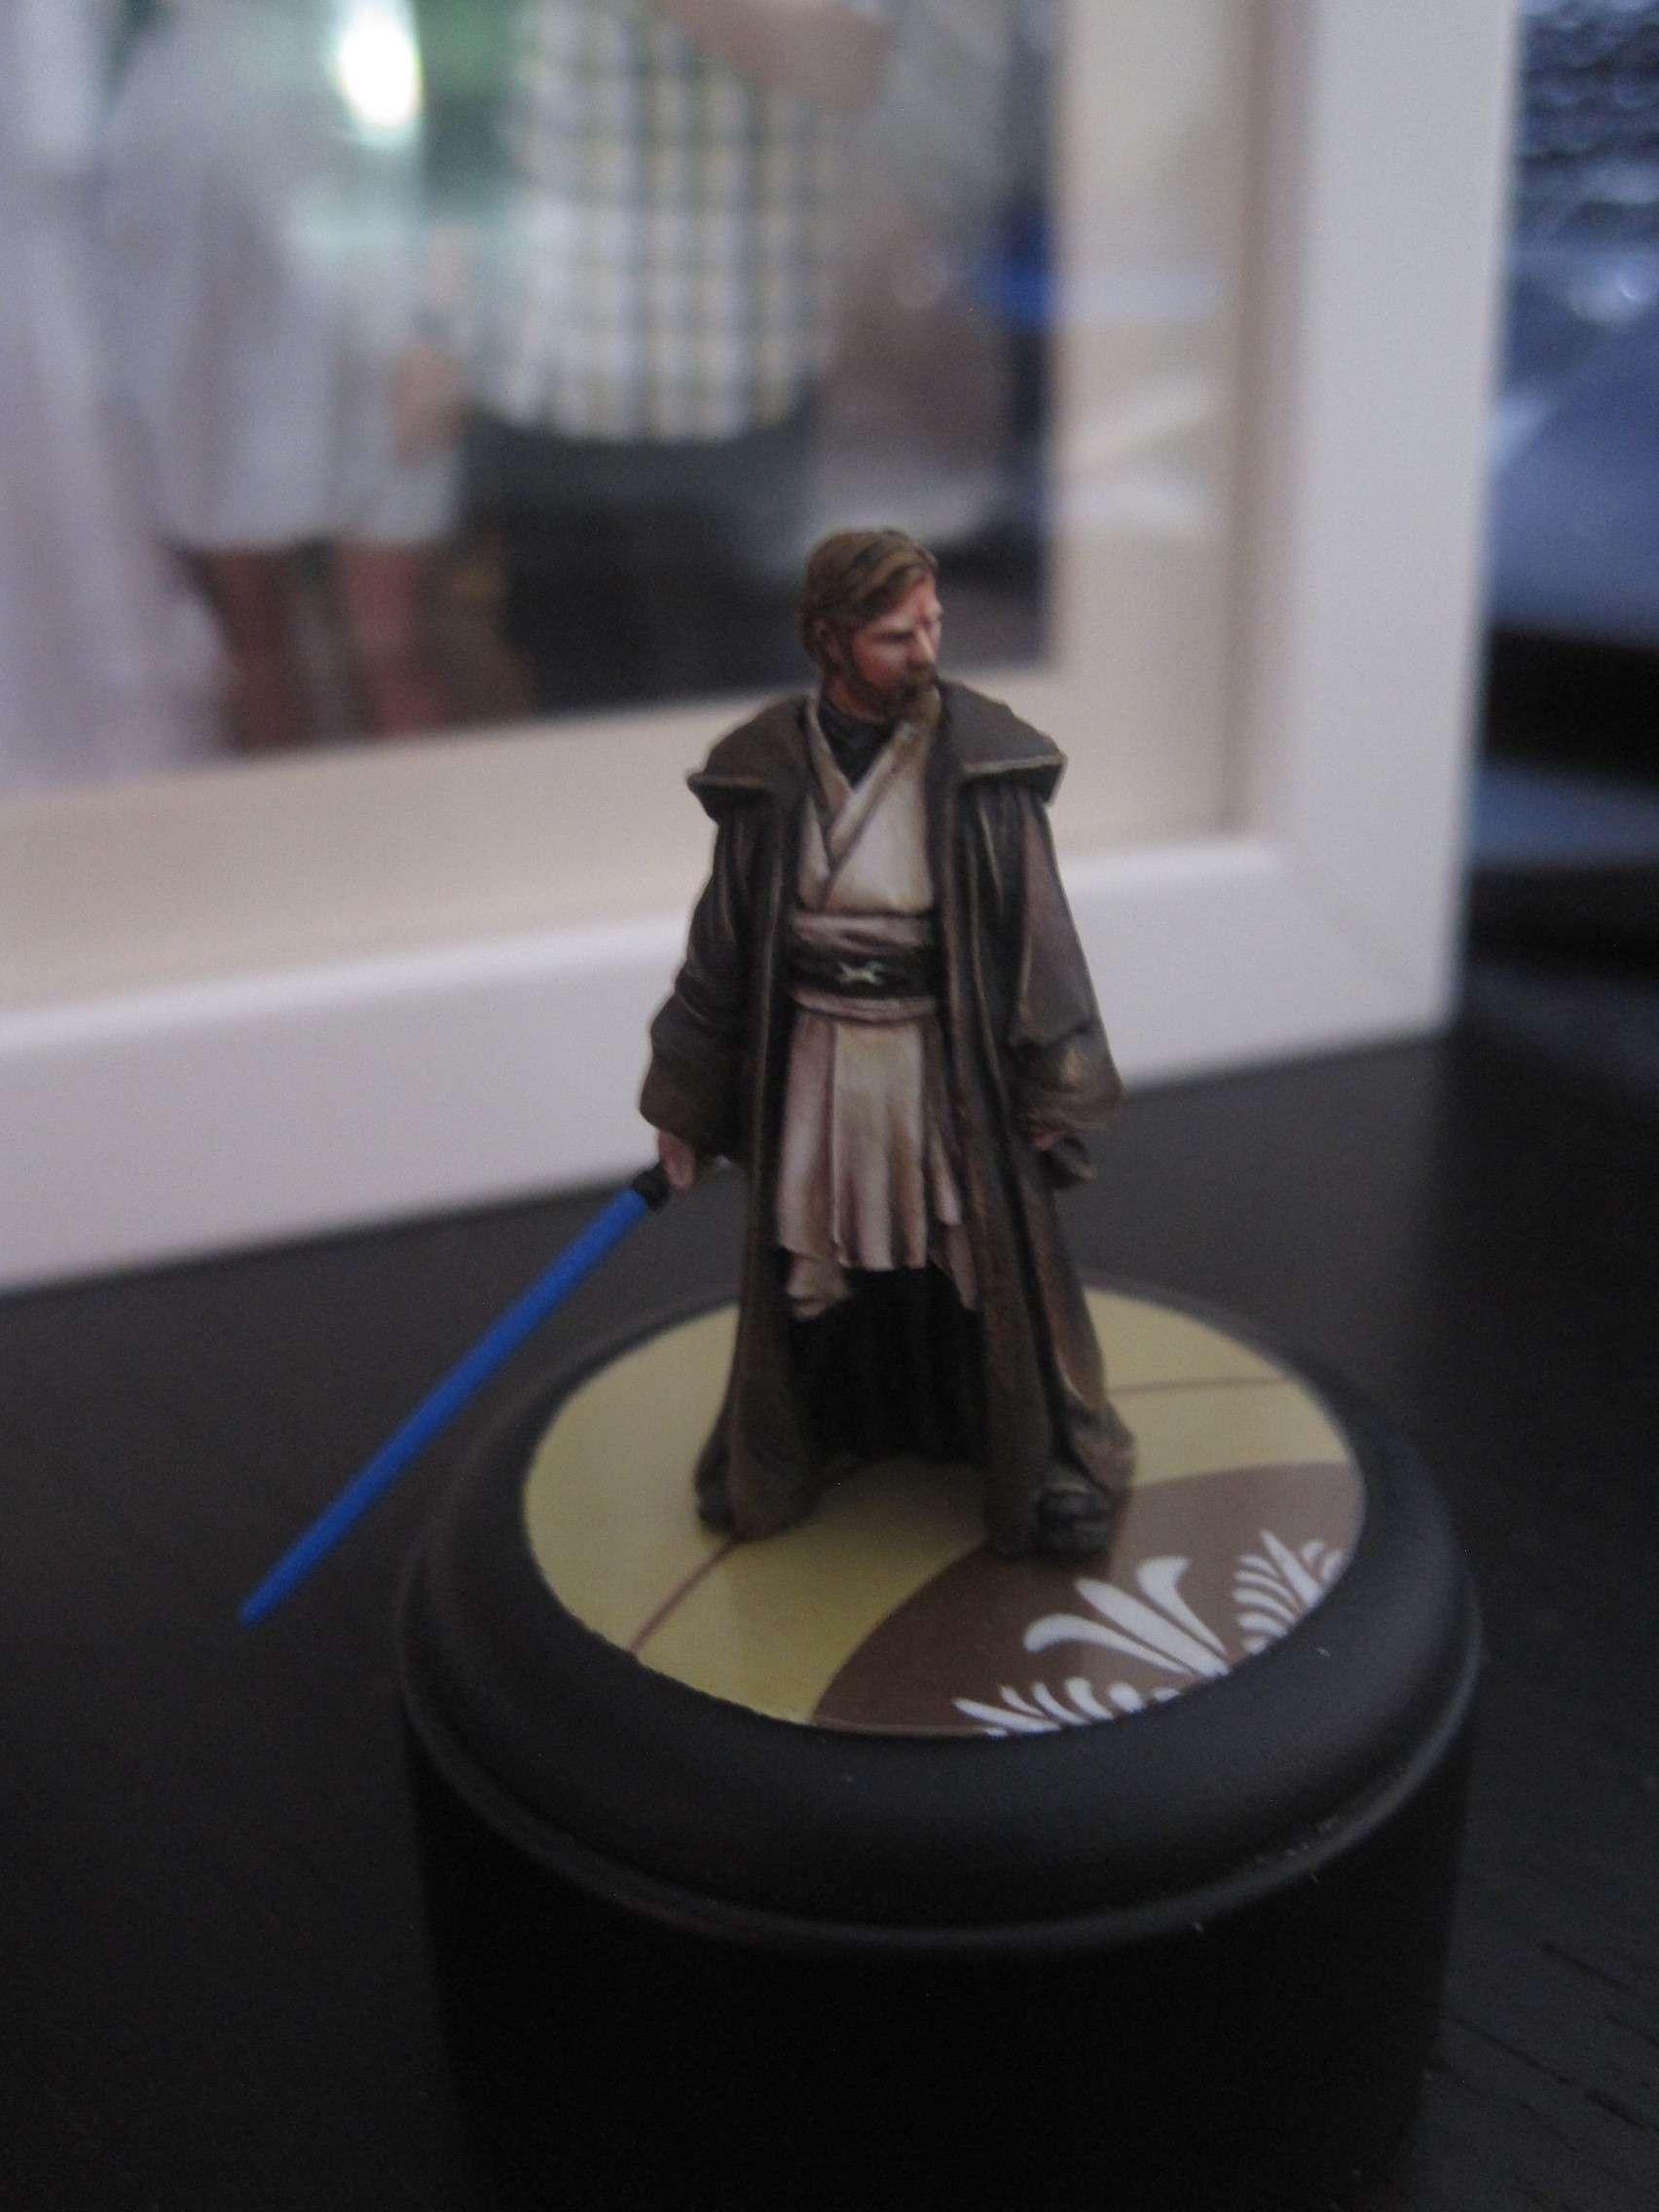 Obi Wan Kenobi Img_6411